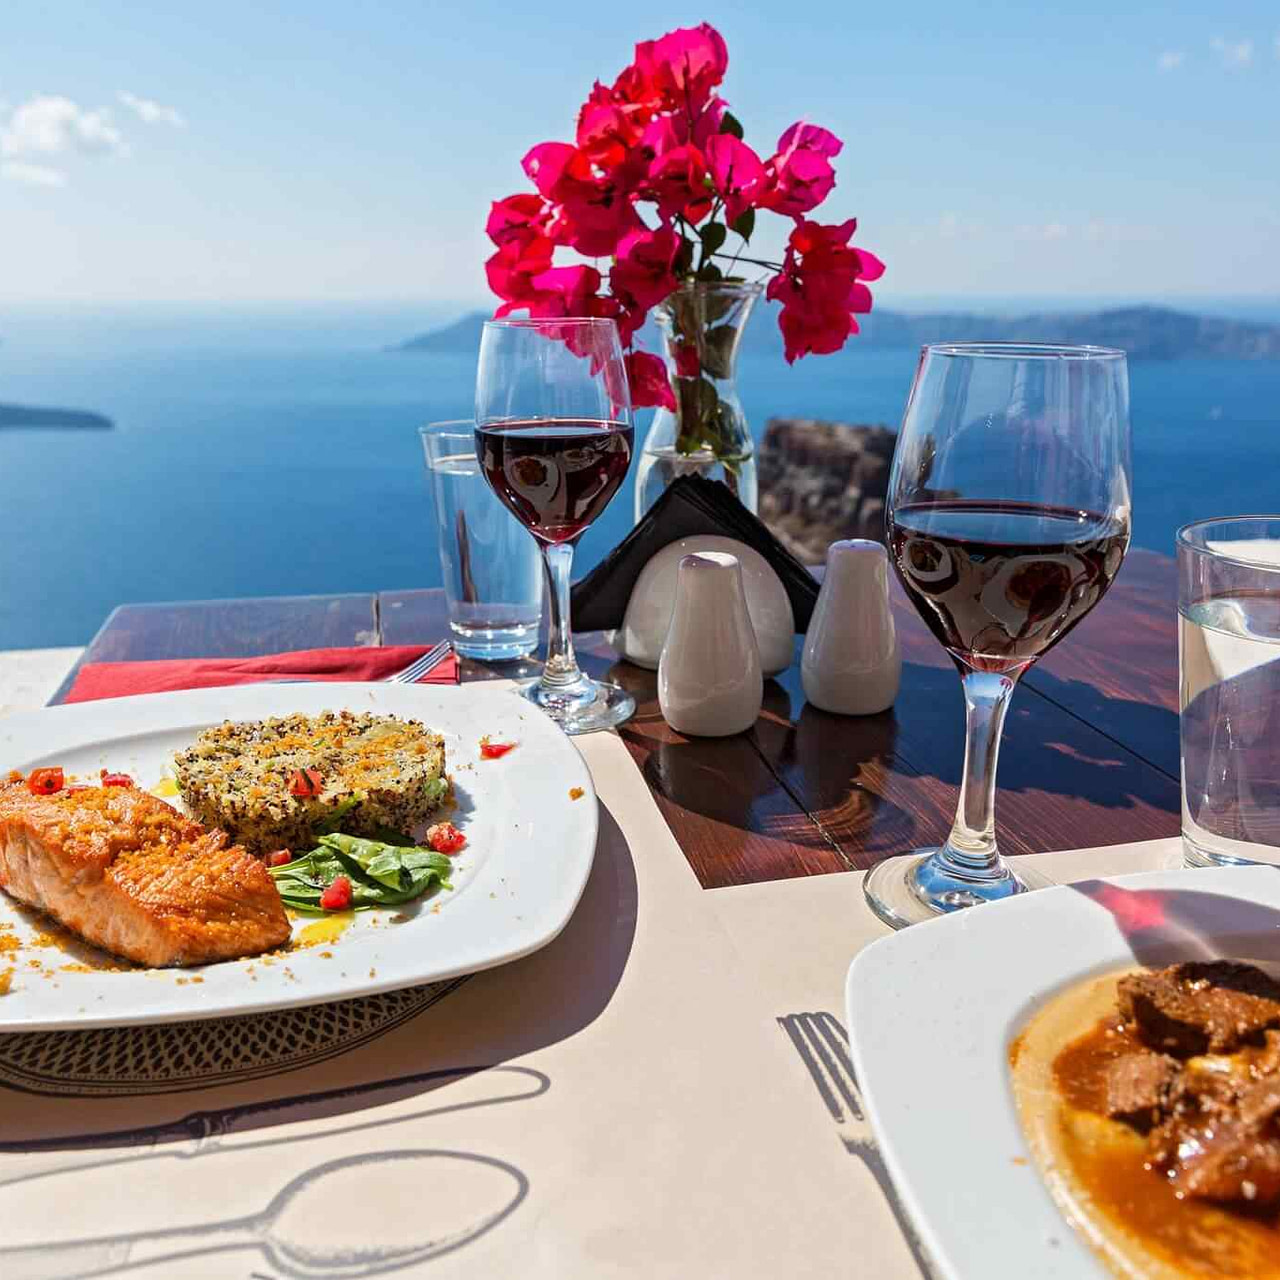 https://mlohvc80vfmp.i.optimole.com/KzqGvII-JyRAARxu/w:1280/h:1280/q:90/rt:fill/g:ce/https://www.apperitivo-directory.beer/wp-content/uploads/2017/10/restaurant-italian-25.jpg